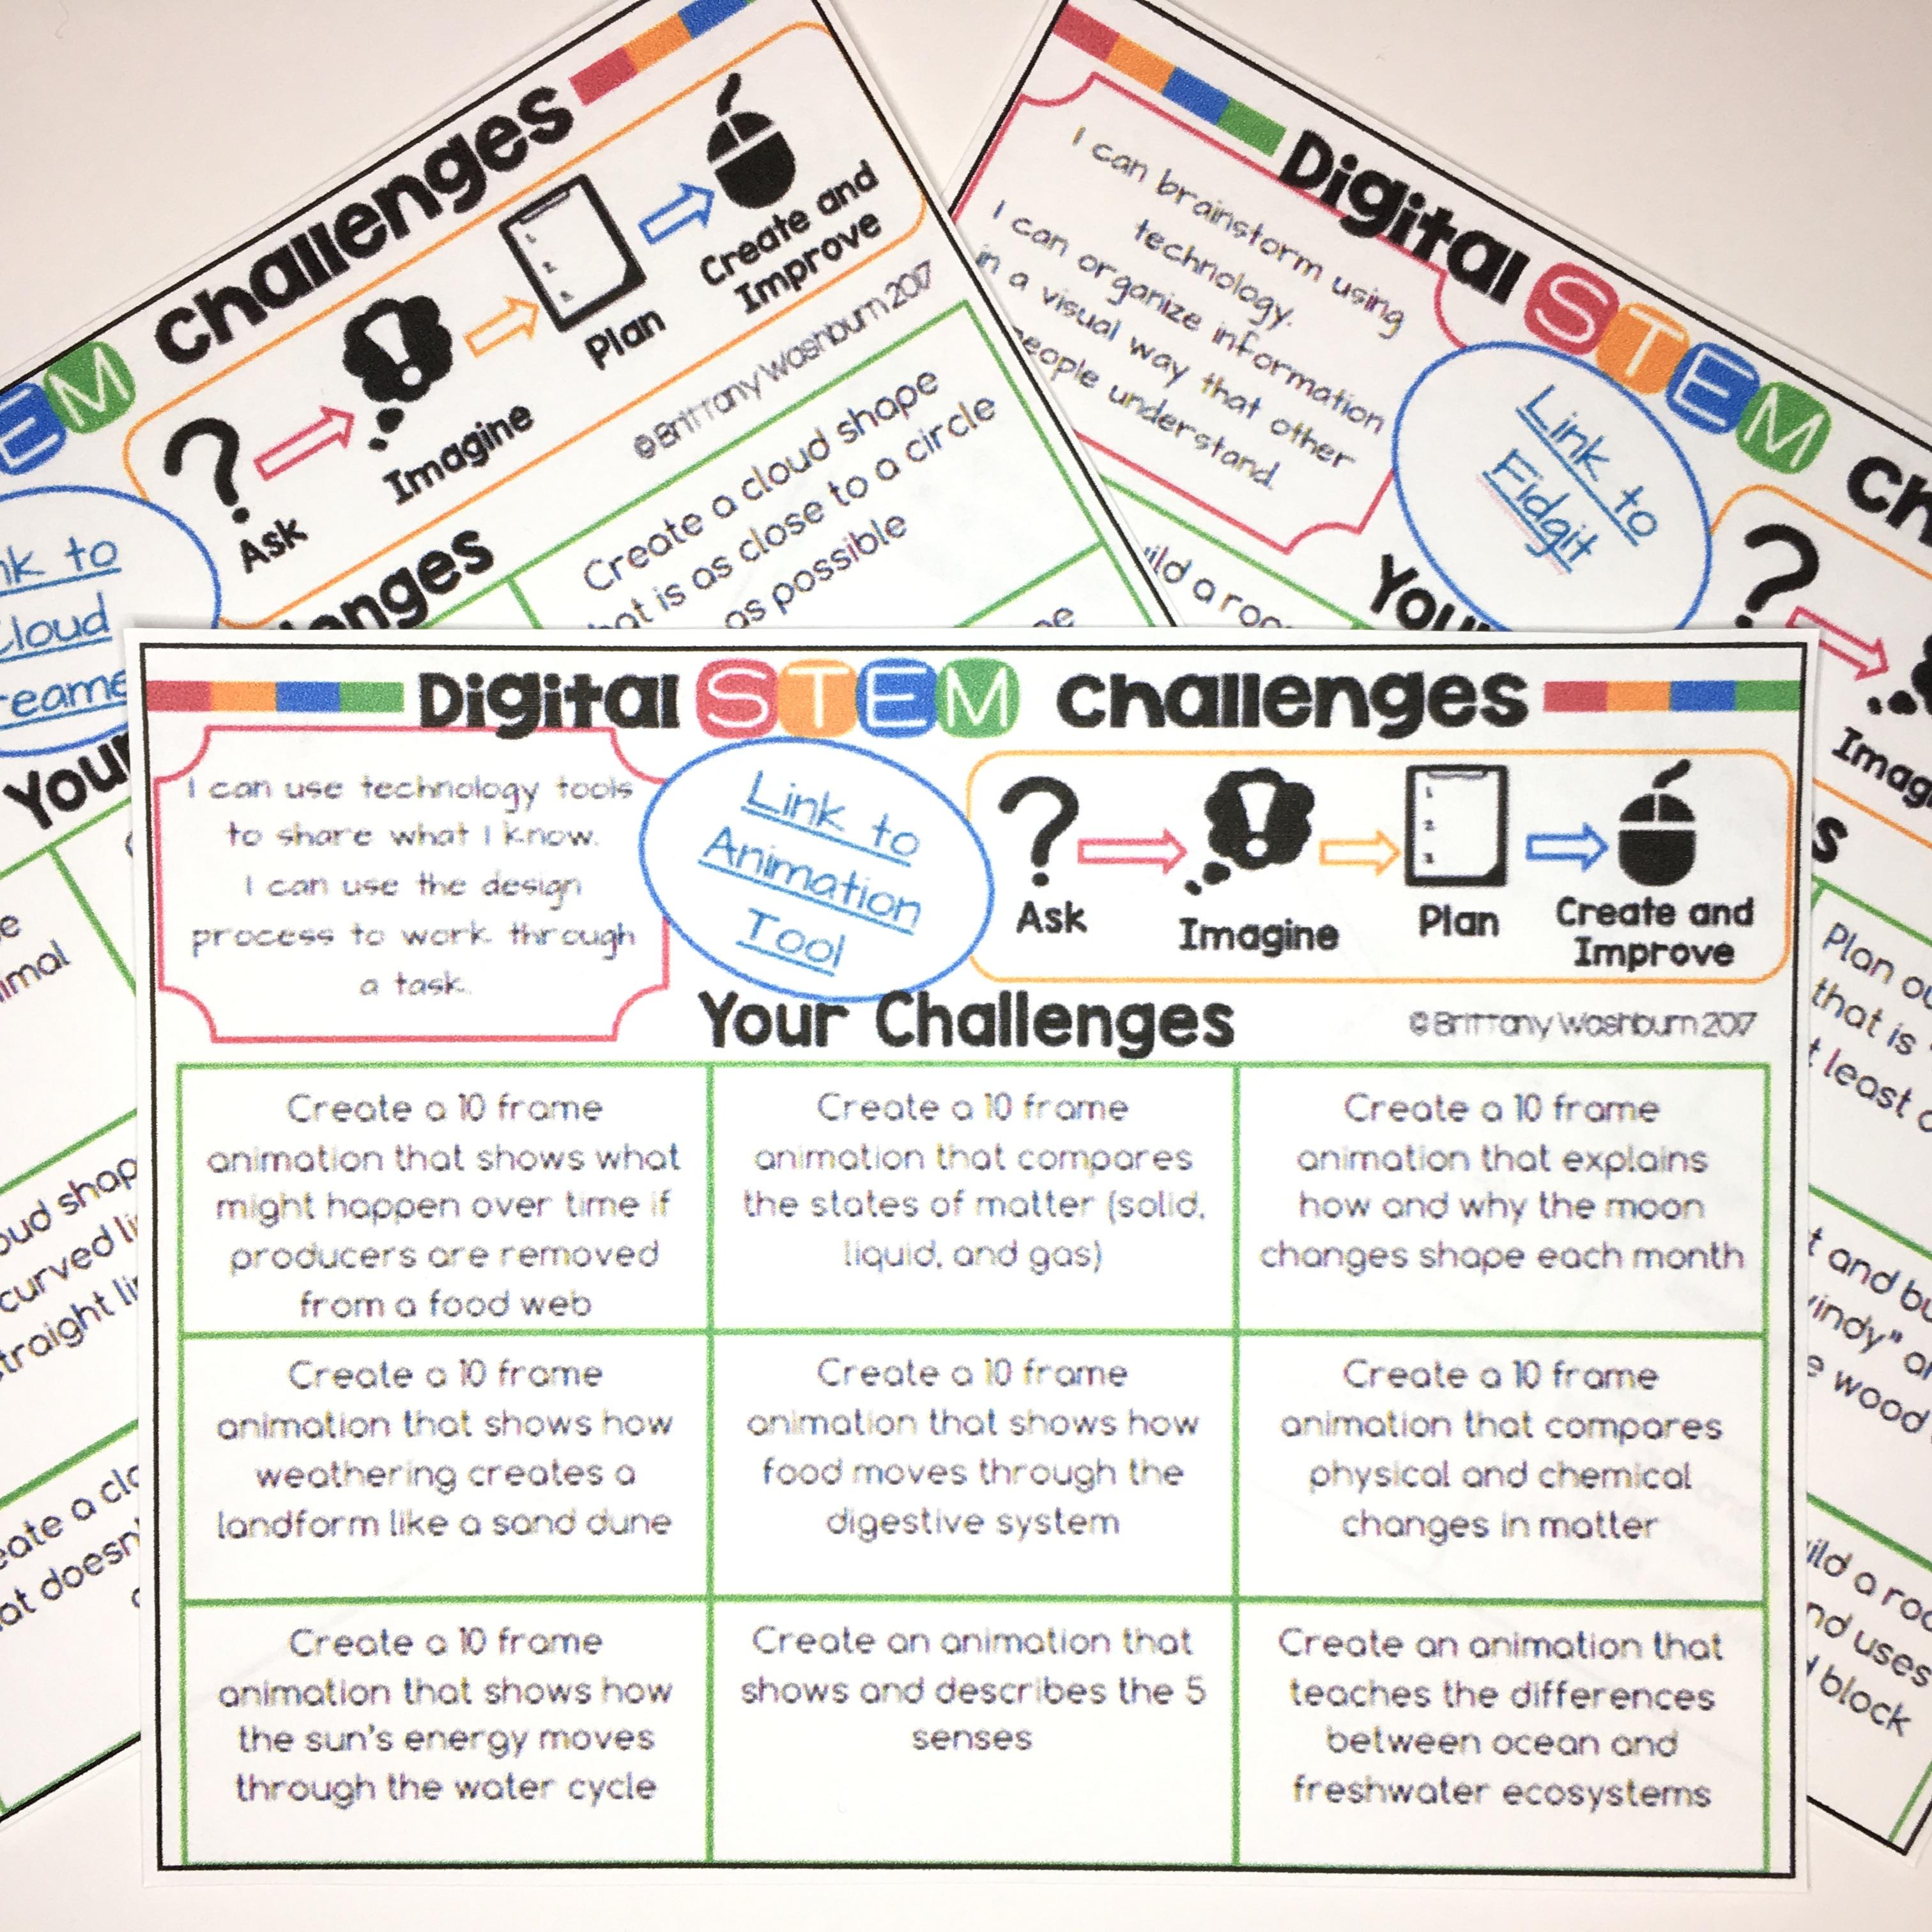 Digital Stem Challenges For Websites And Apps Stem Activities For Kids